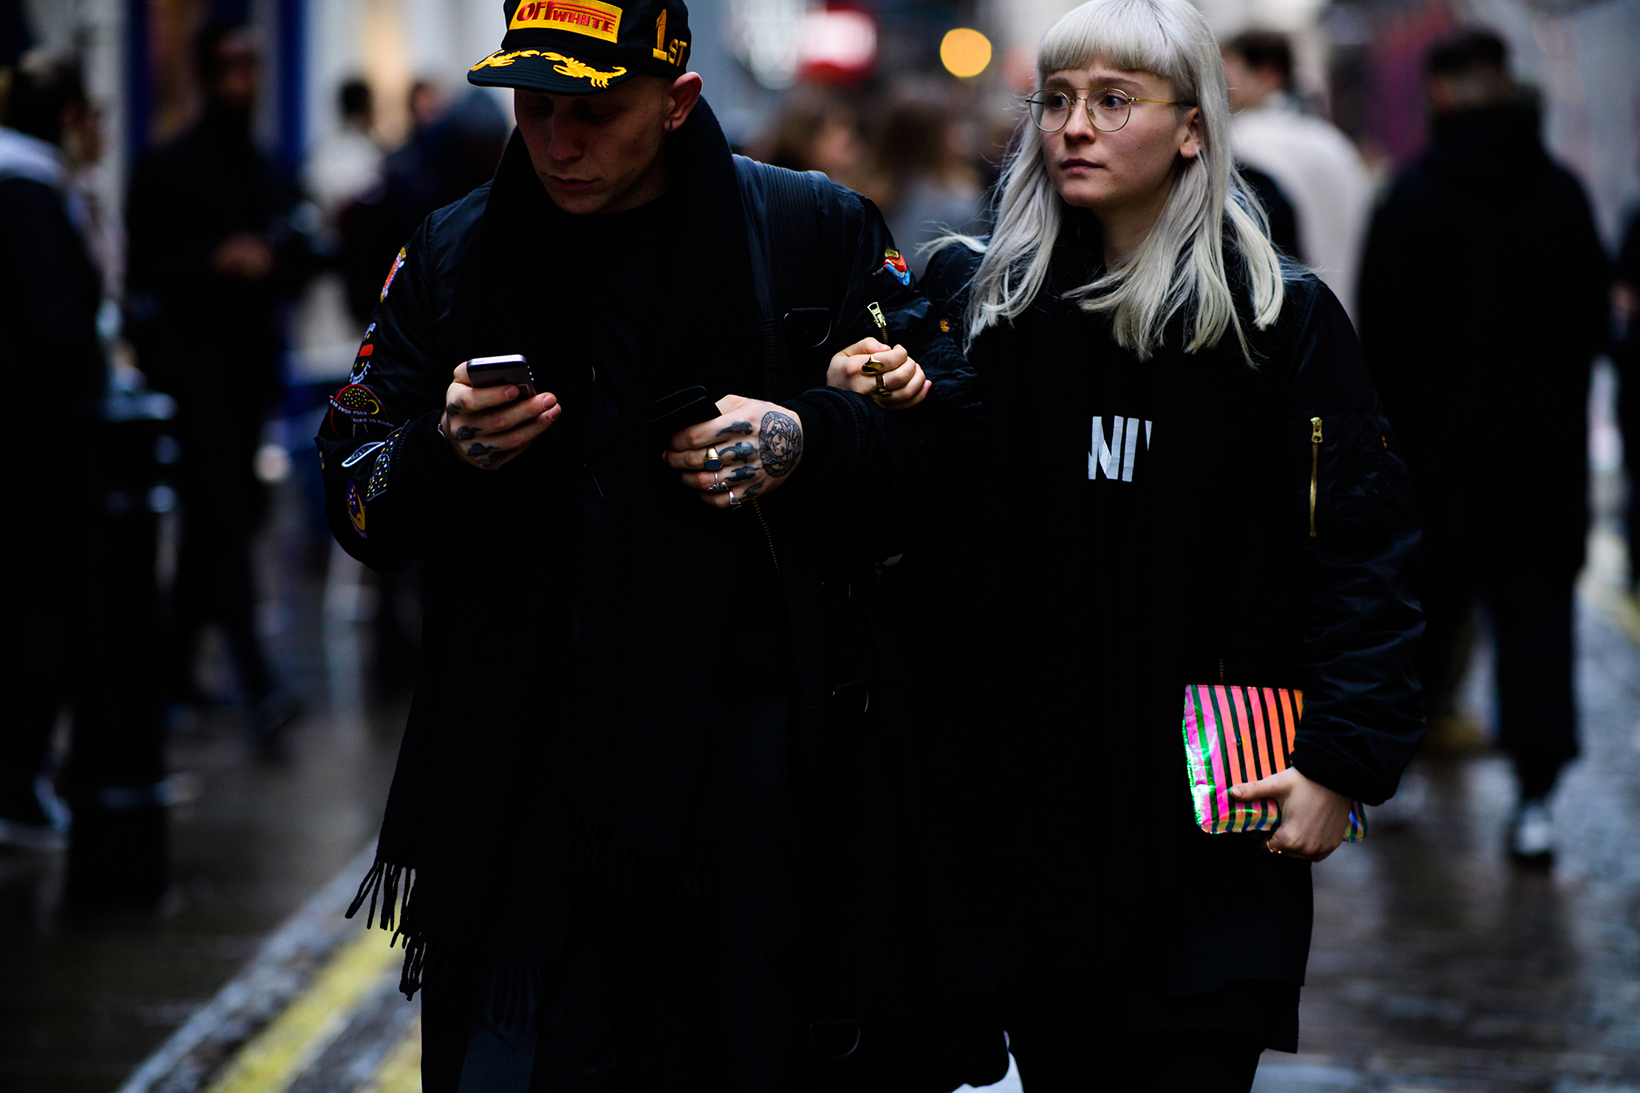 Women's Streetsnaps London Fashion Week Men's January 2017 - 79187